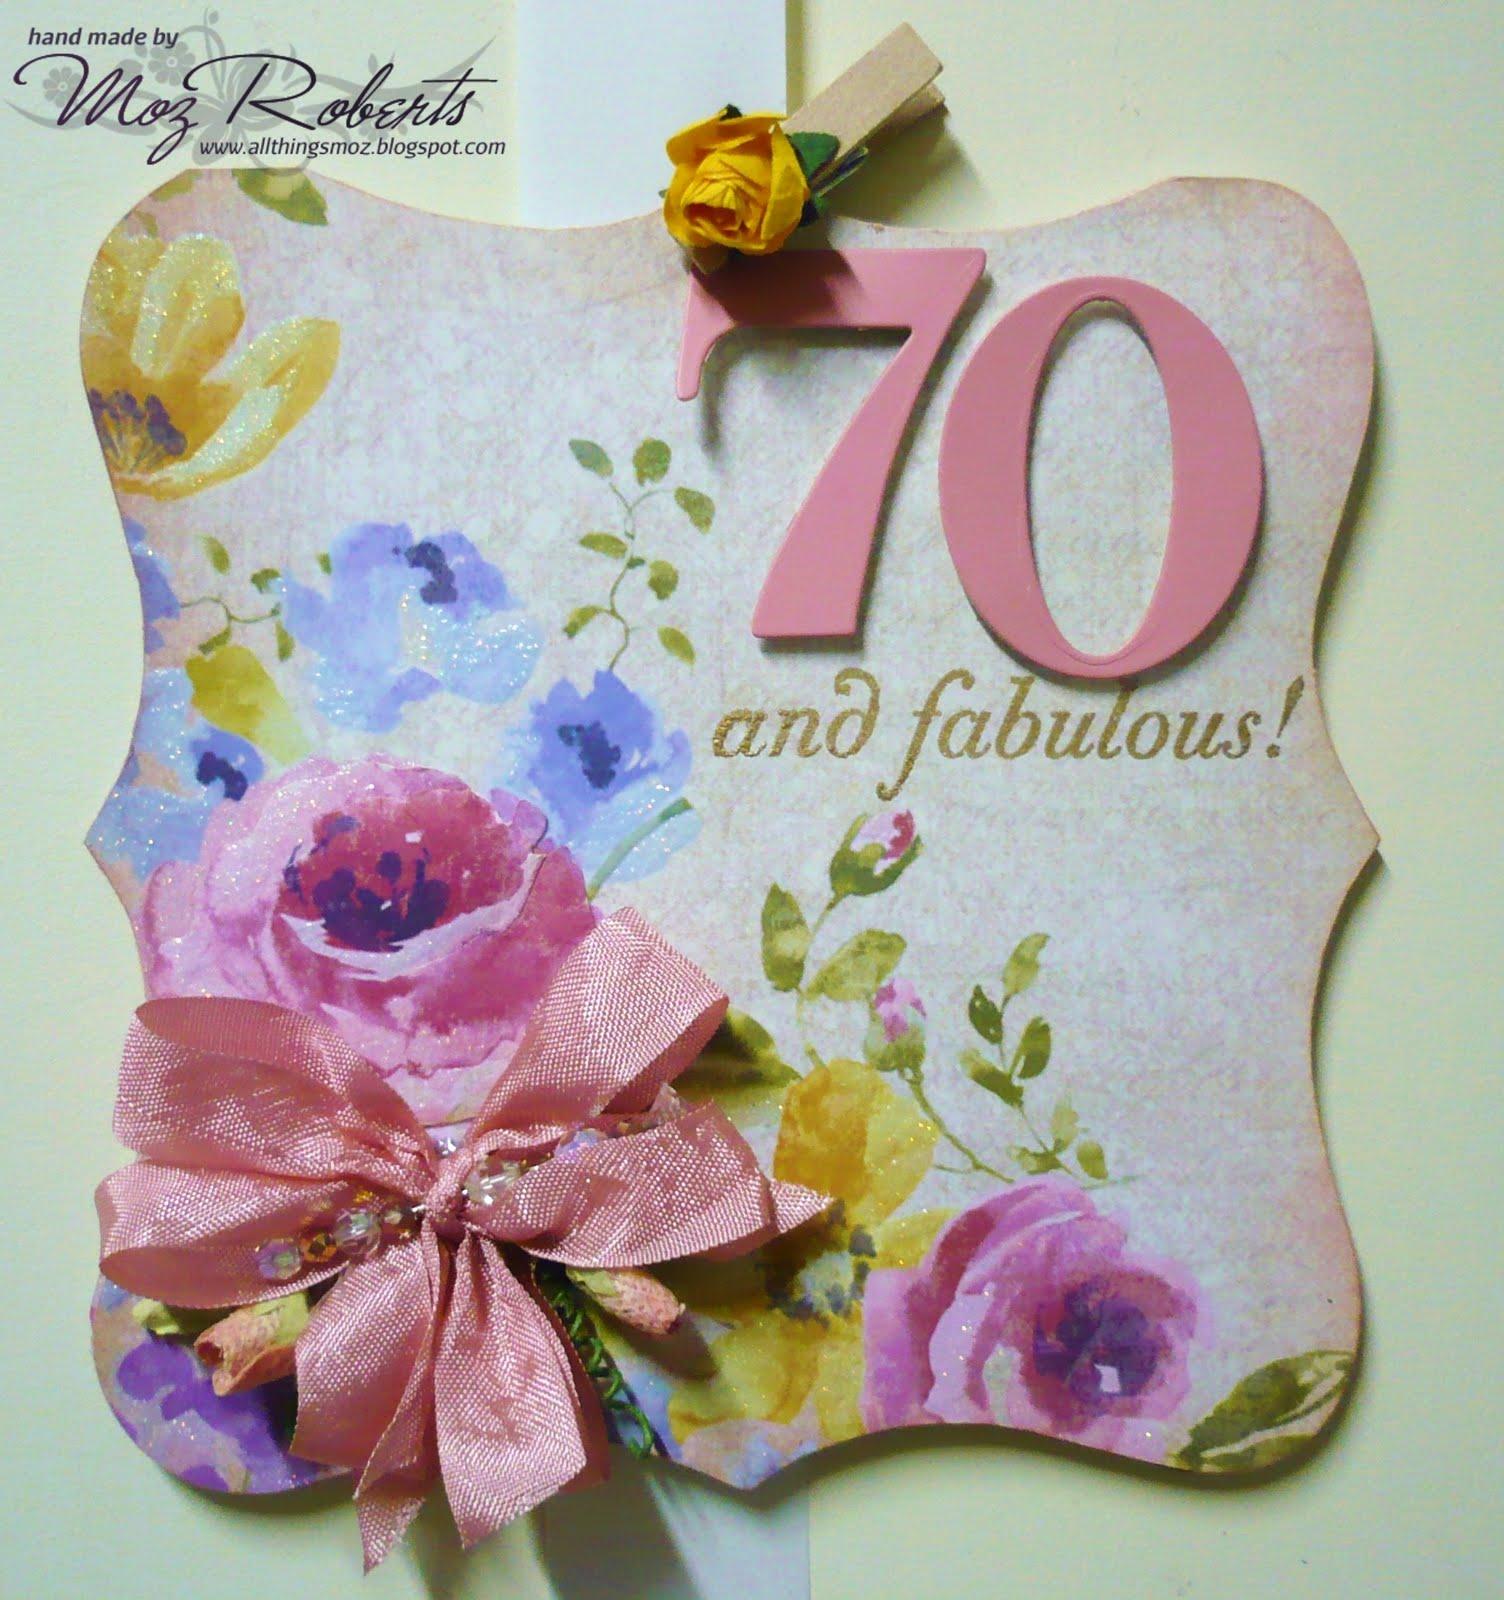 special 70th birthday ideas